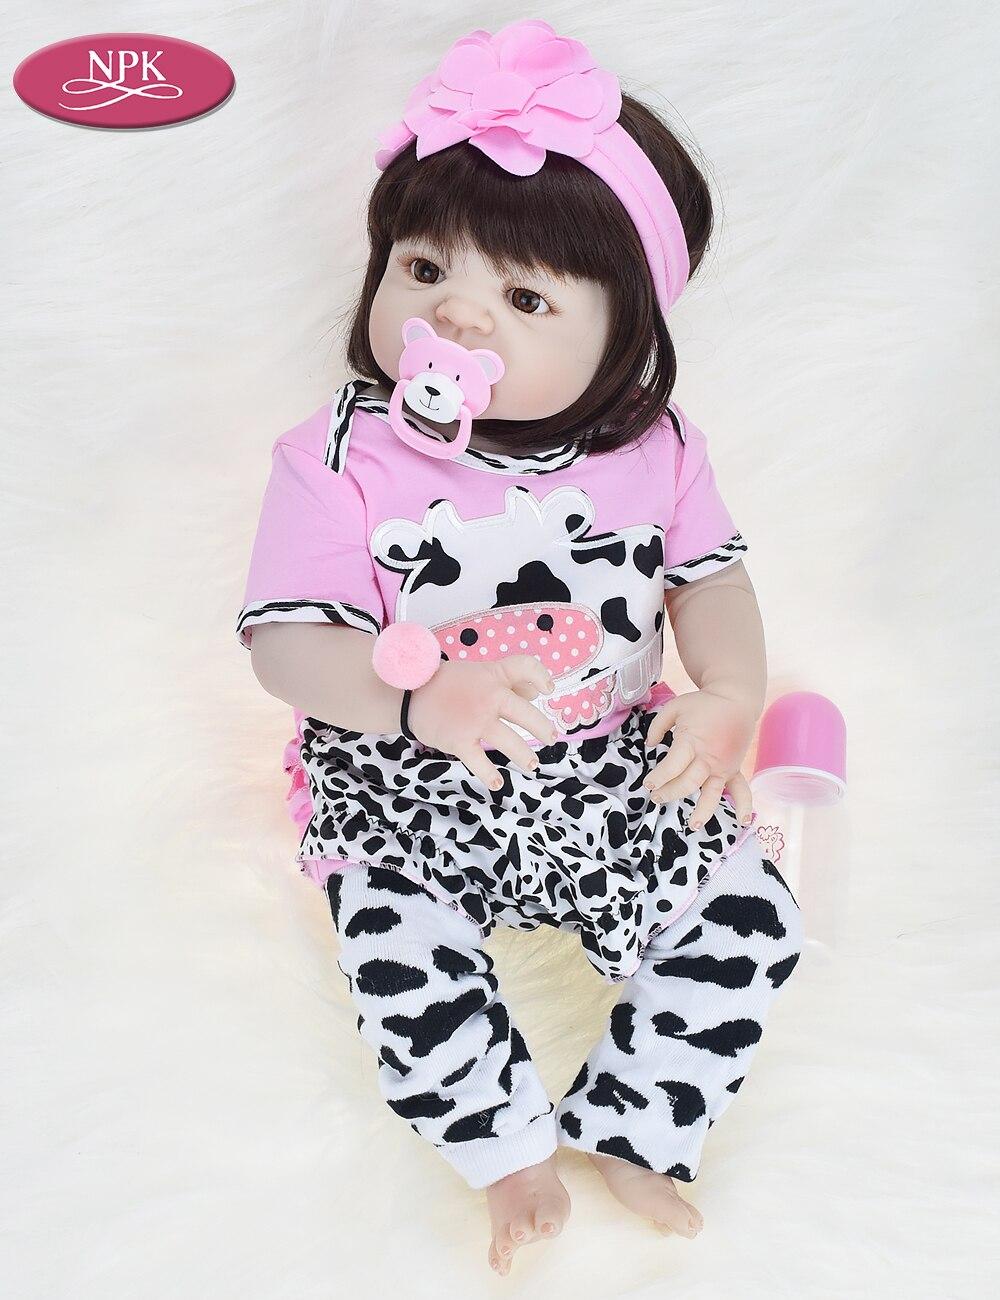 NPK Real 57CM Full Body SIlicone Girl Reborn Babies Doll Bath Toy Lifelike Newborn Princess Baby Doll Bonecas Bebe Reborn Menina (7)